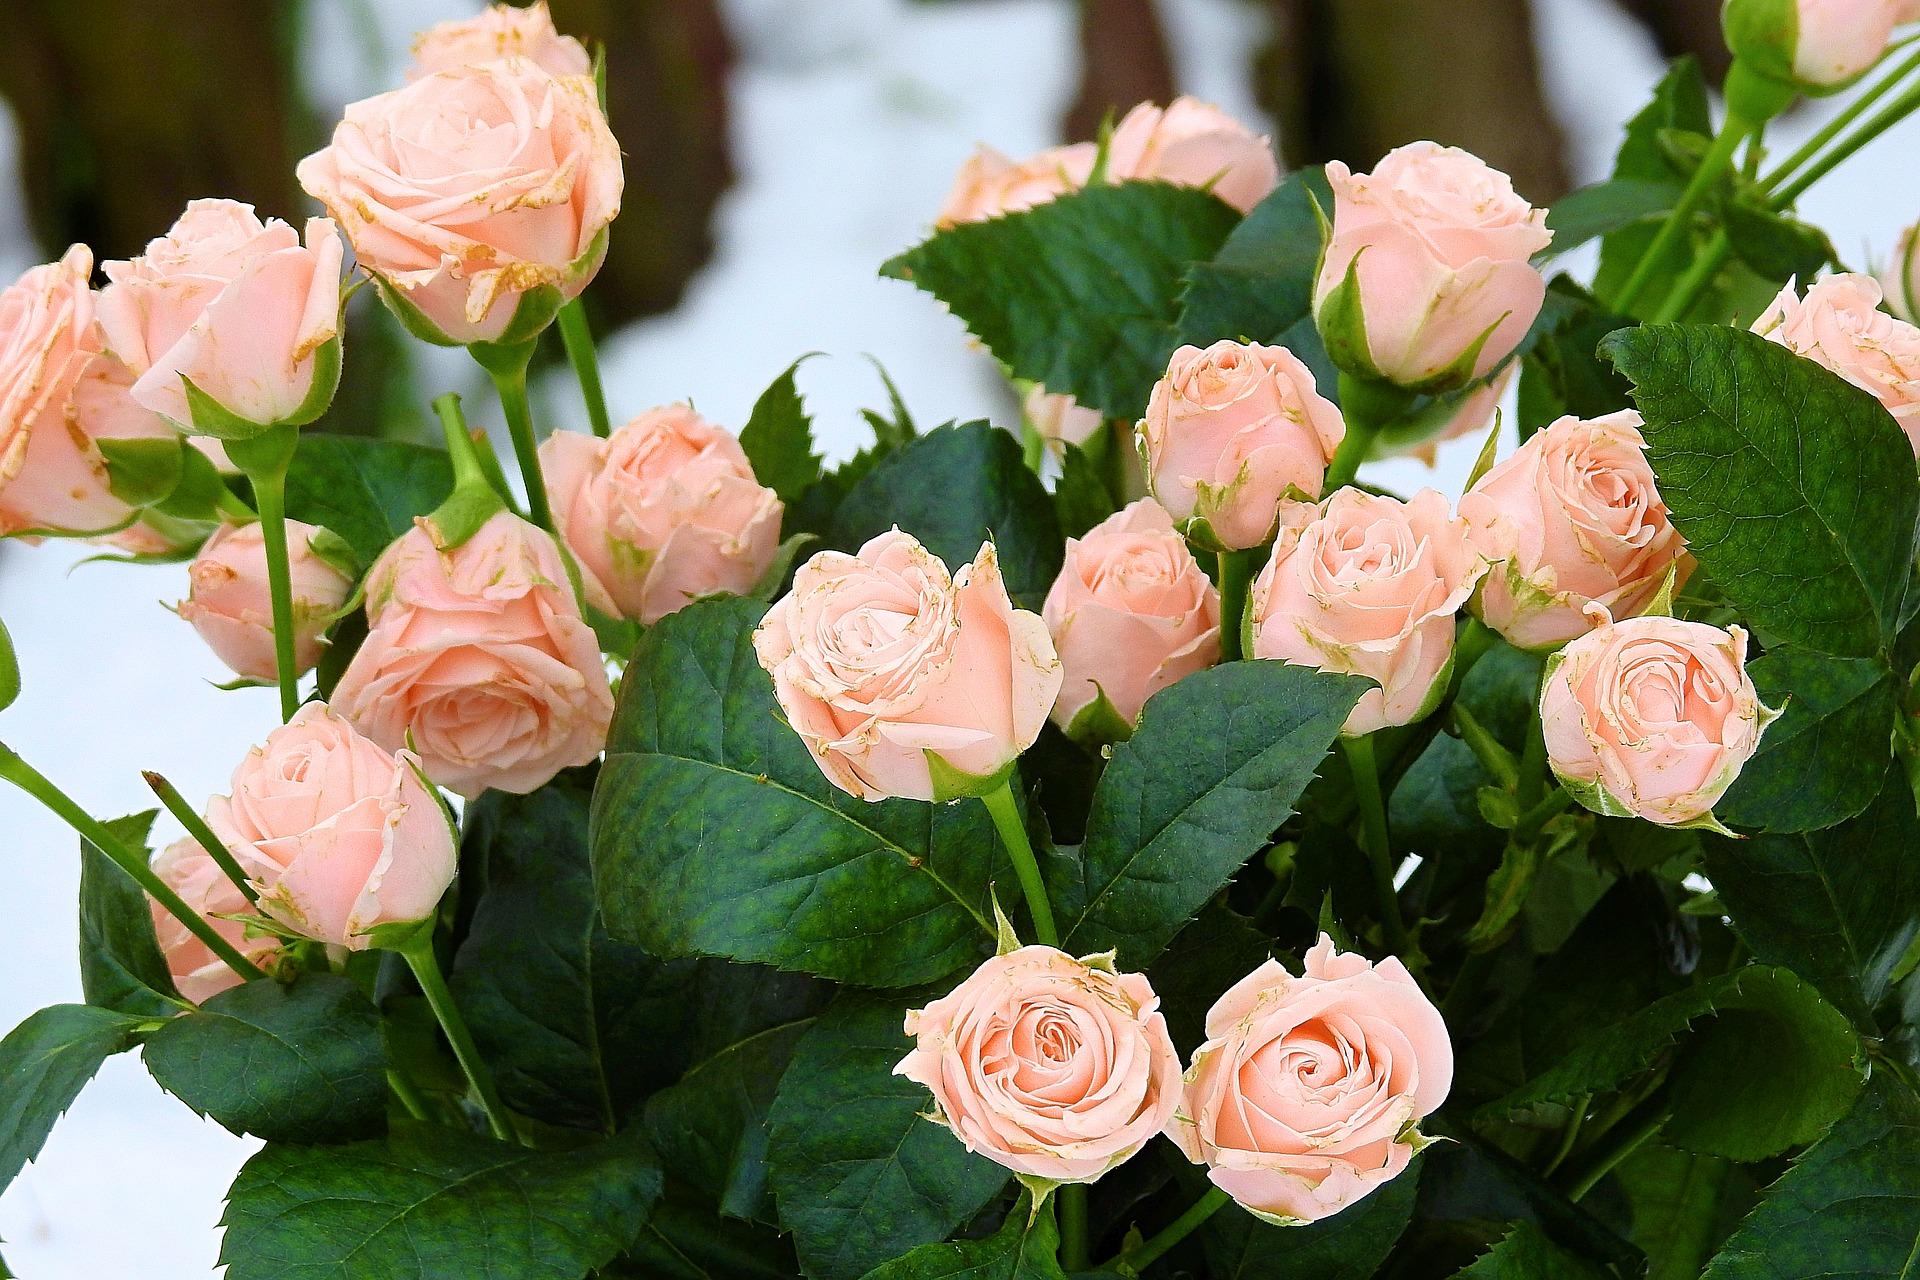 Ingrijire trandafiri - sfatulparintilor.ro - pixabay_com - rose-3130788_1920